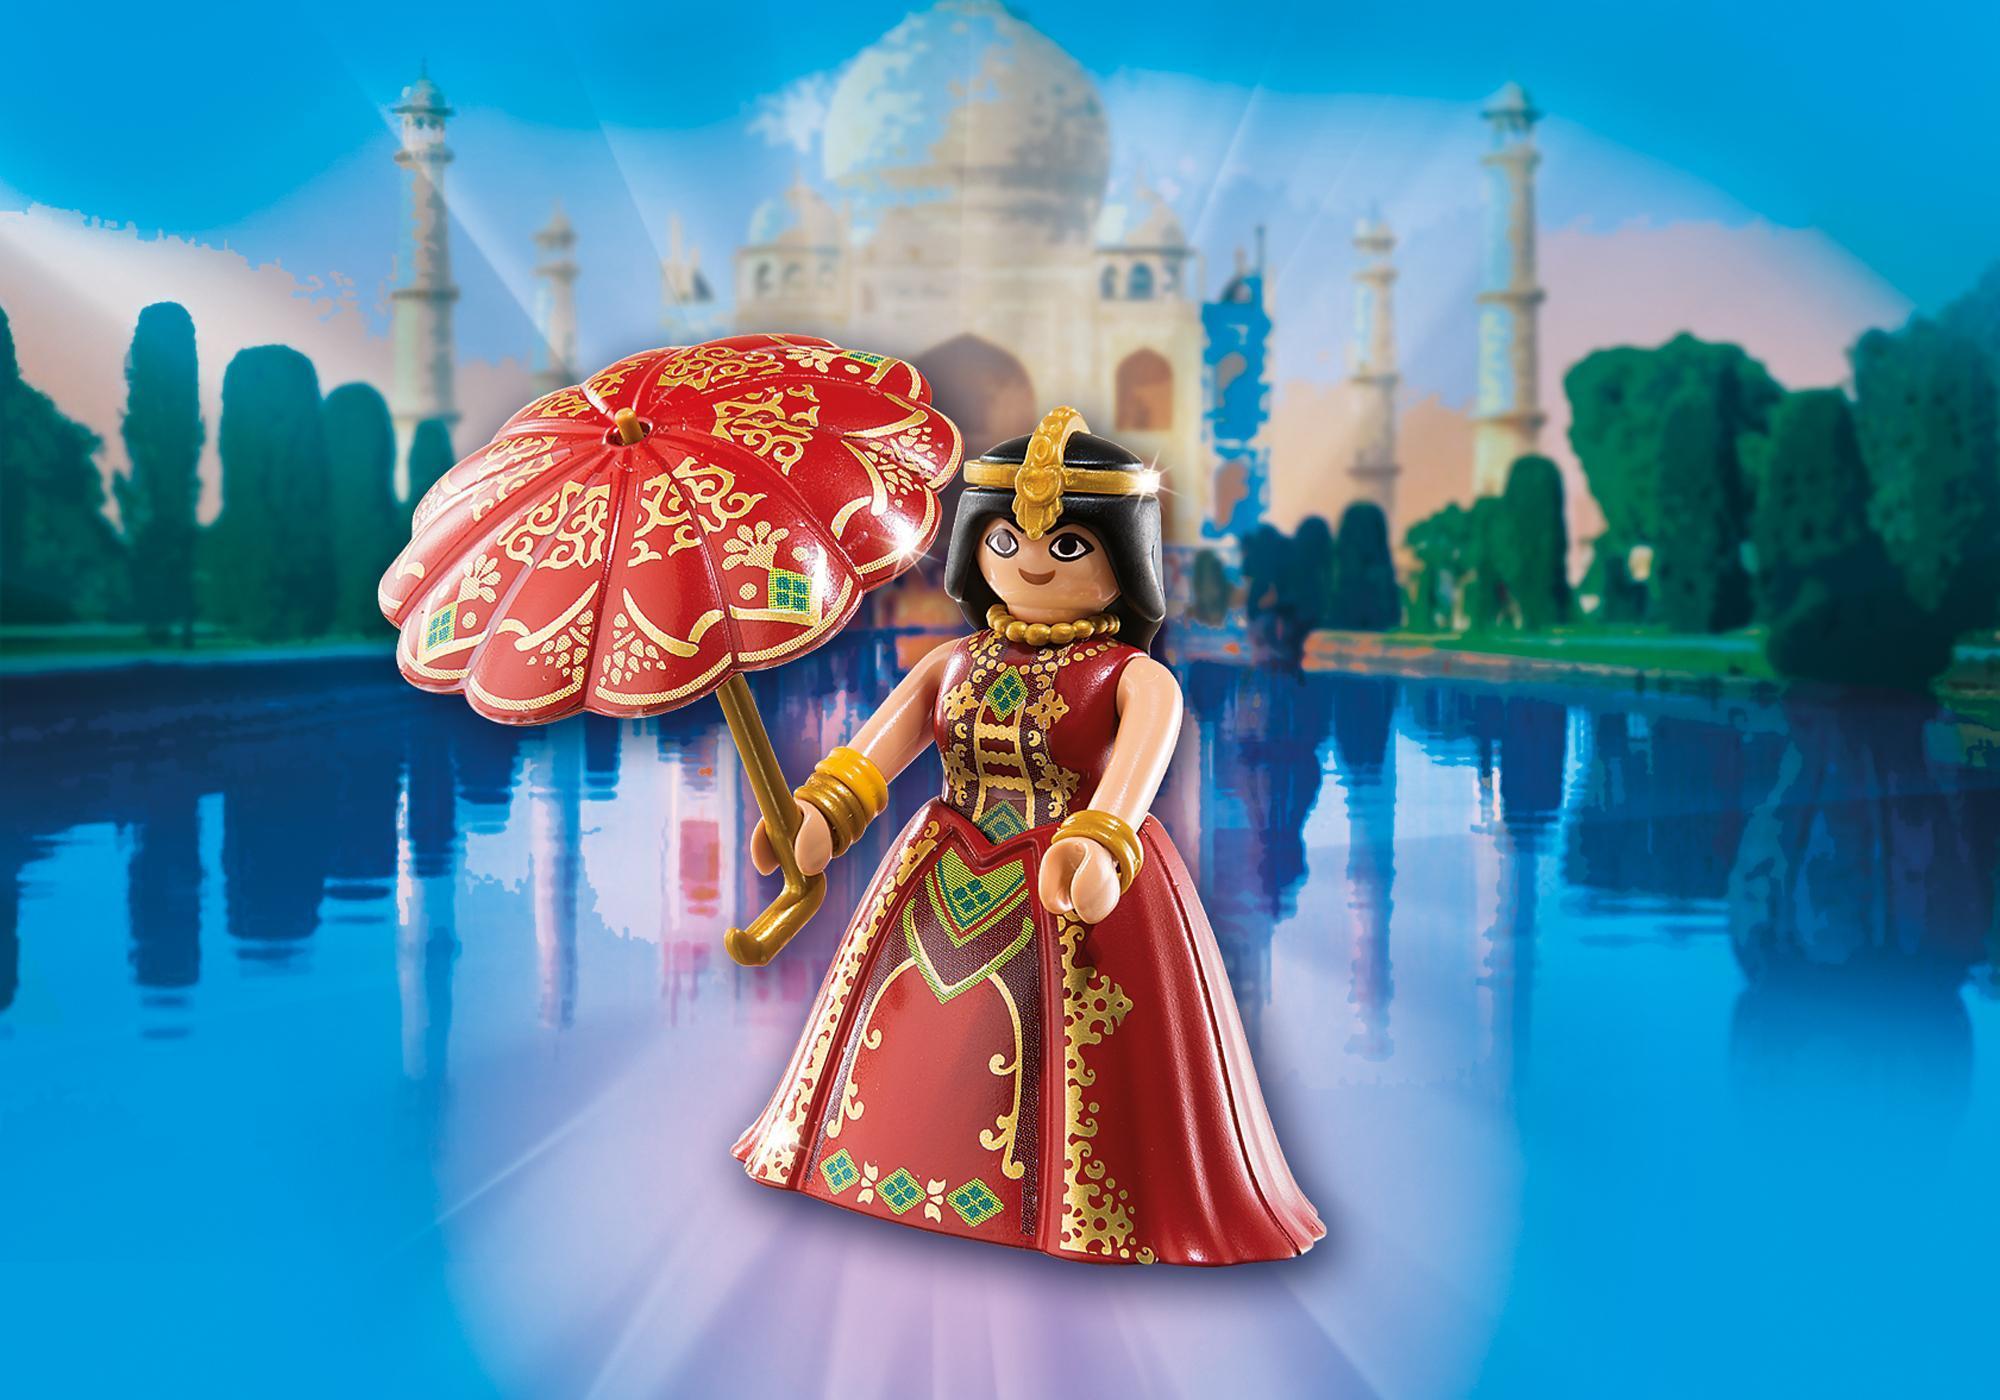 6825_product_detail/Индийская принцесса